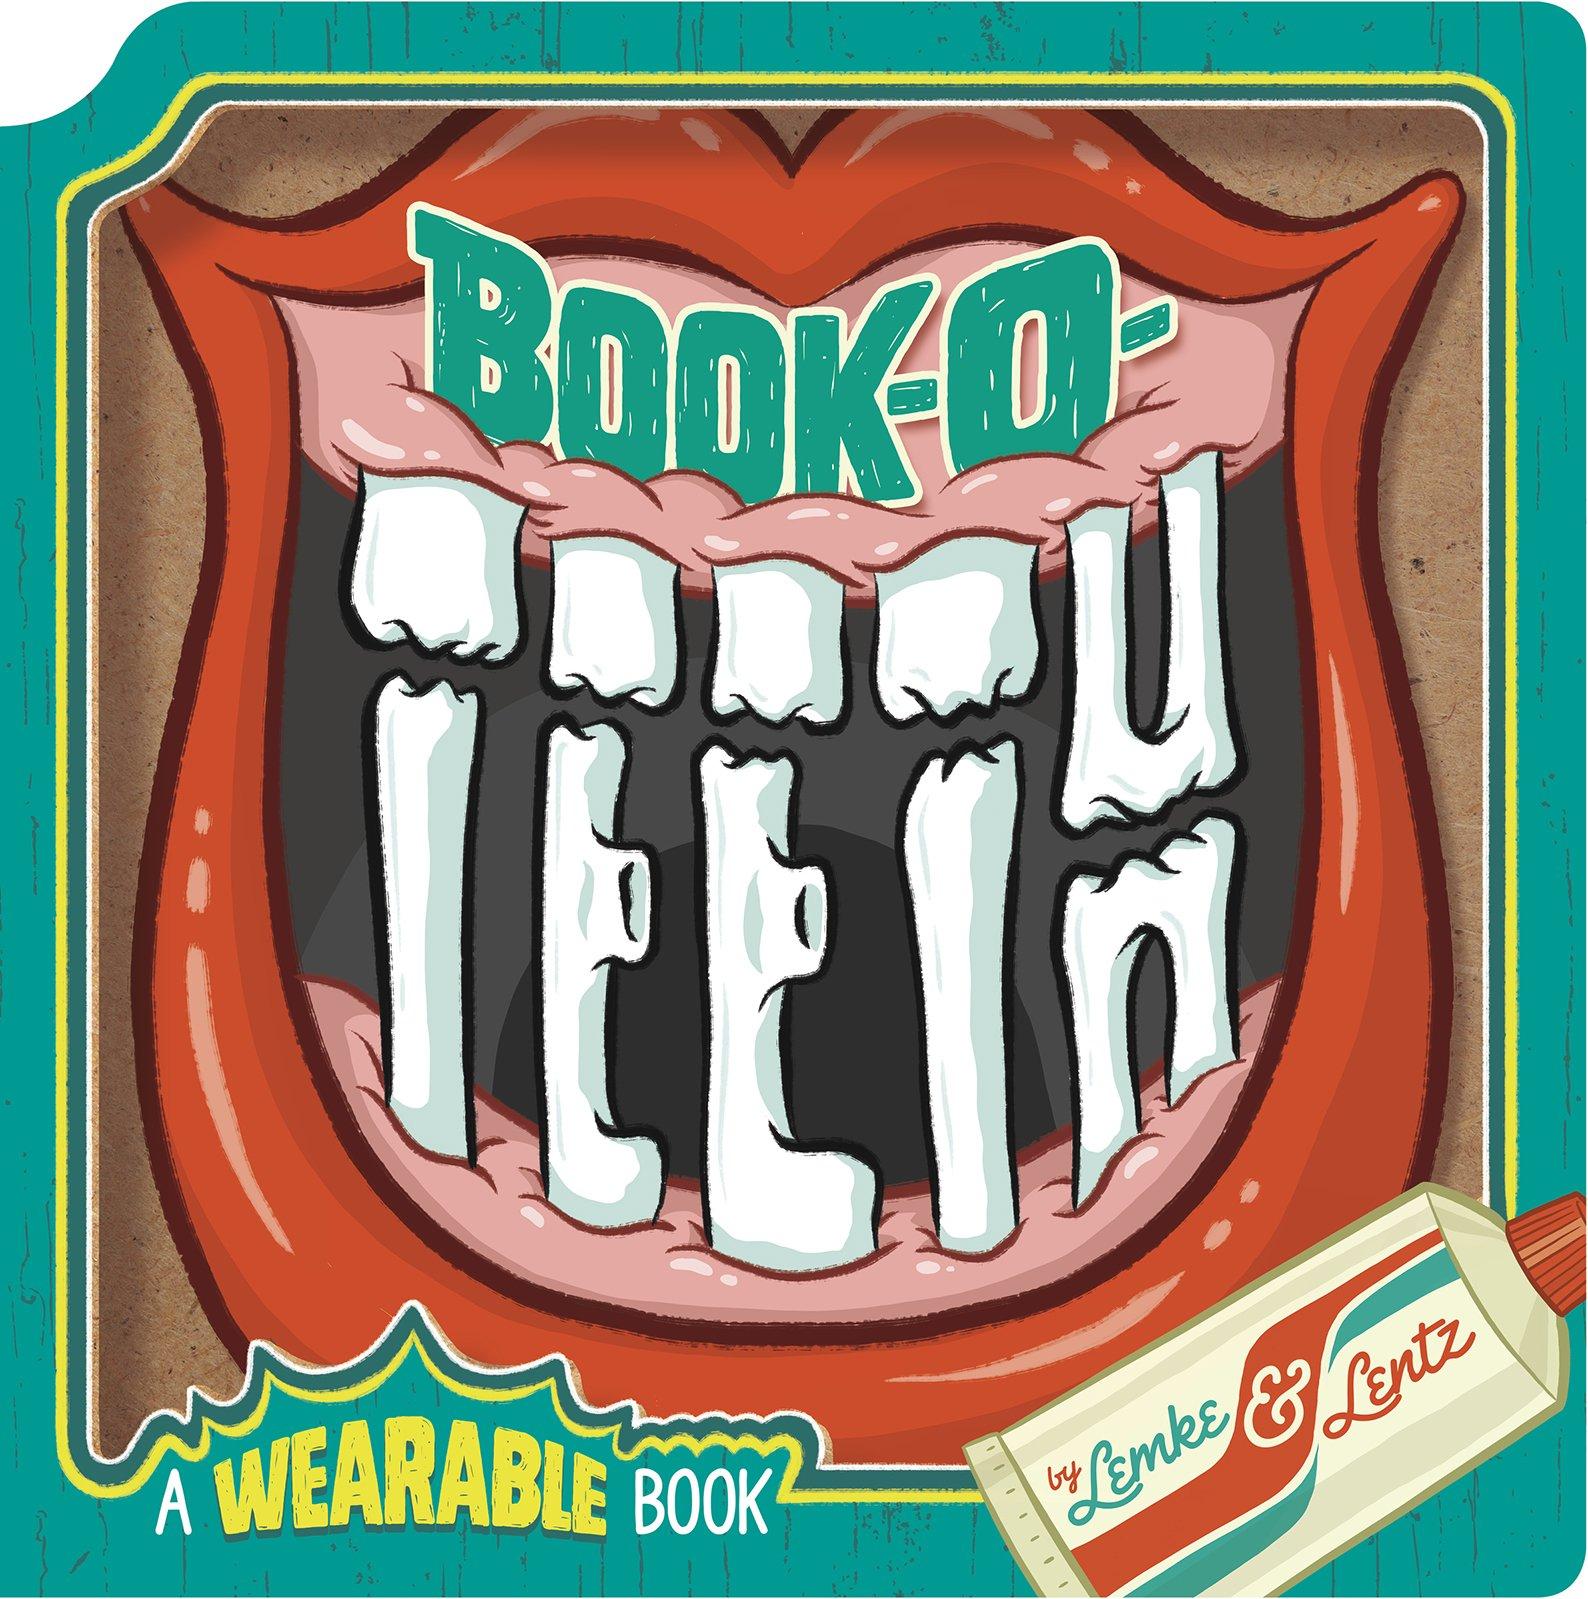 Book-O-Teeth: A Wearable Book (Wearable Books) PDF